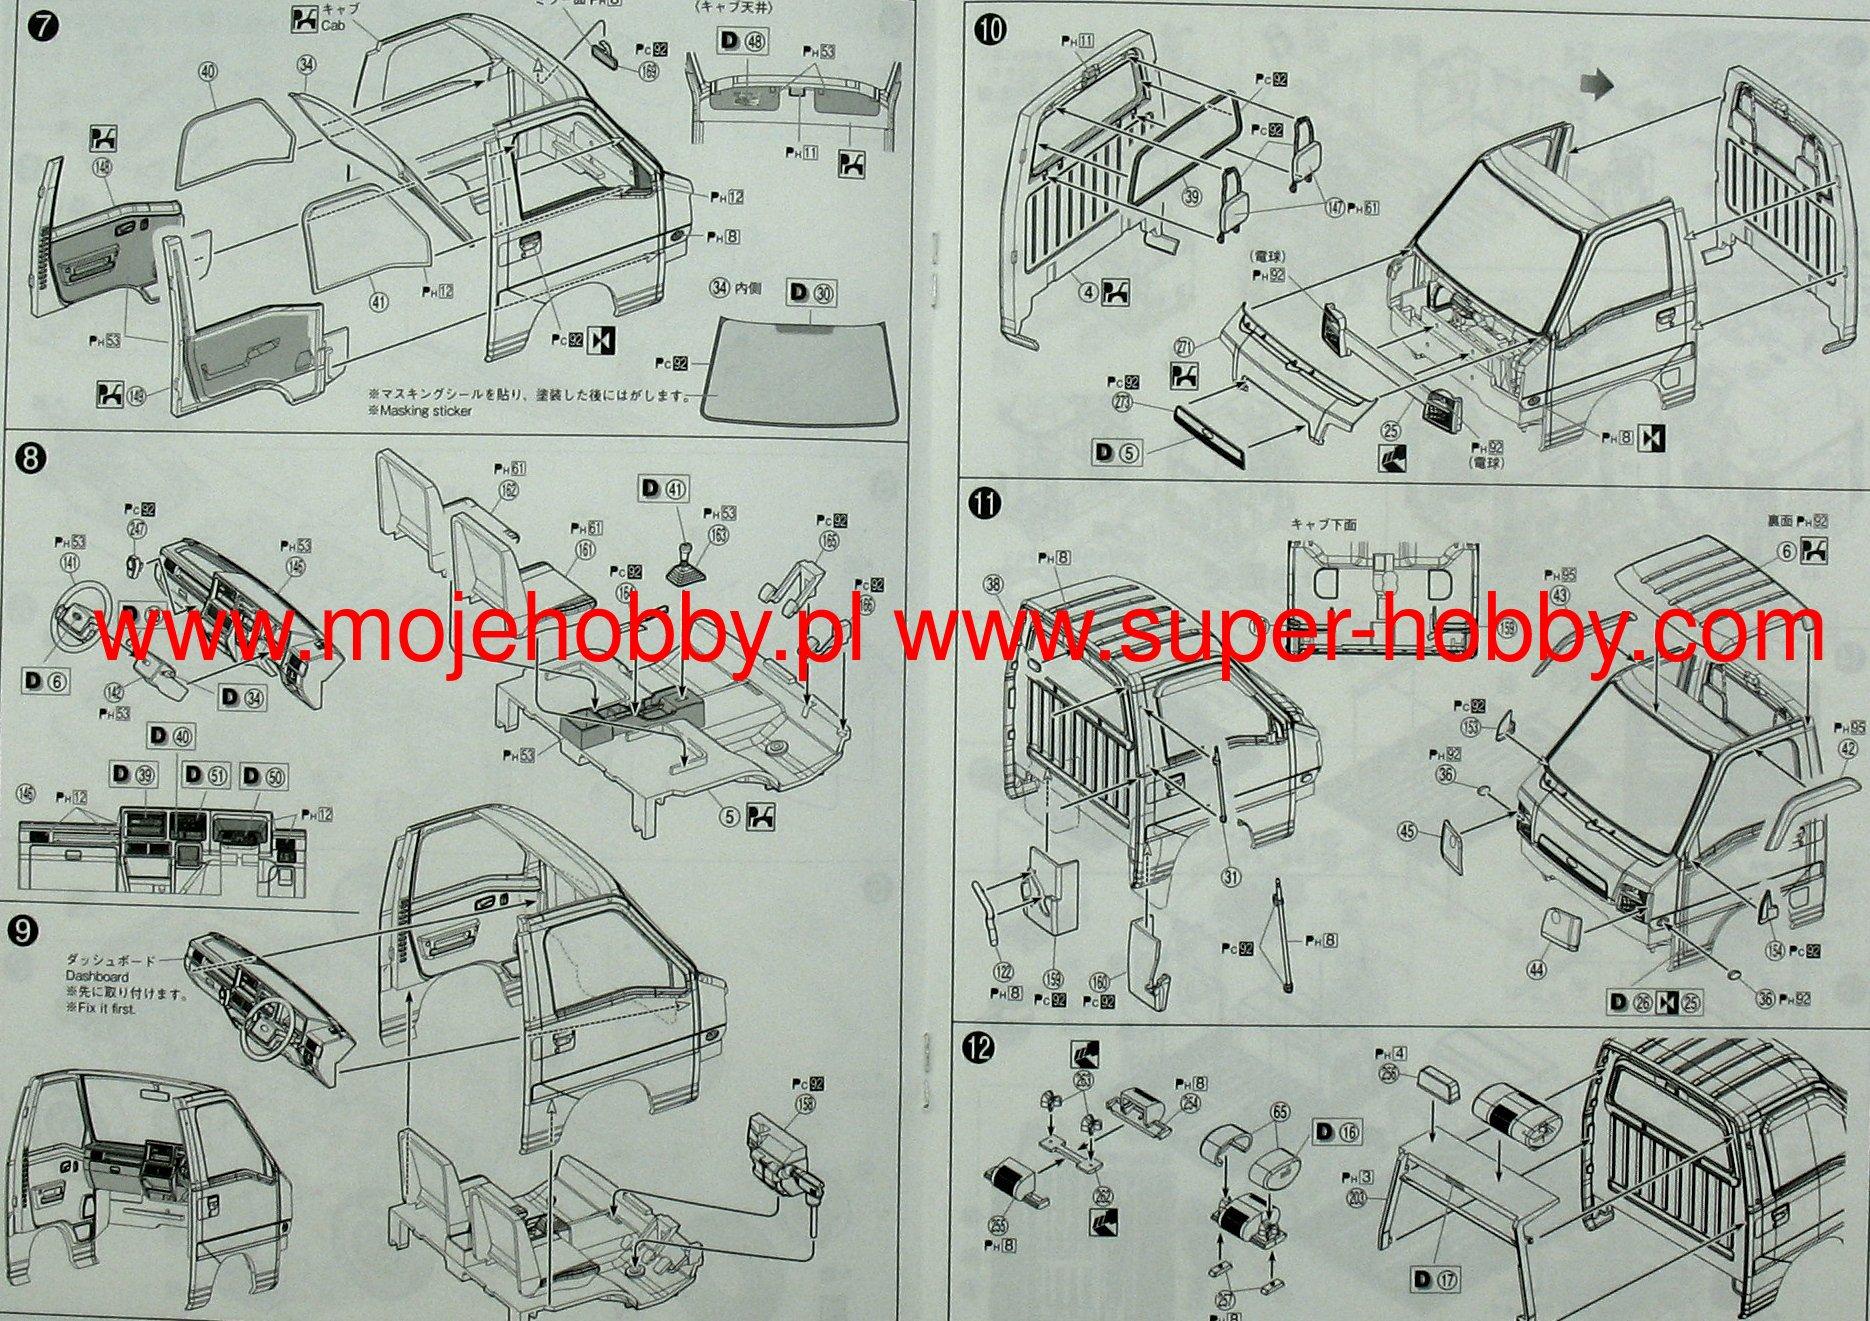 Subaru Sambar Wiring Diagram Diagrams Schematics Country Coach Tt2 The Fire Engine 08 Aoshima 05142 On 1997 Legacy Starter Wires